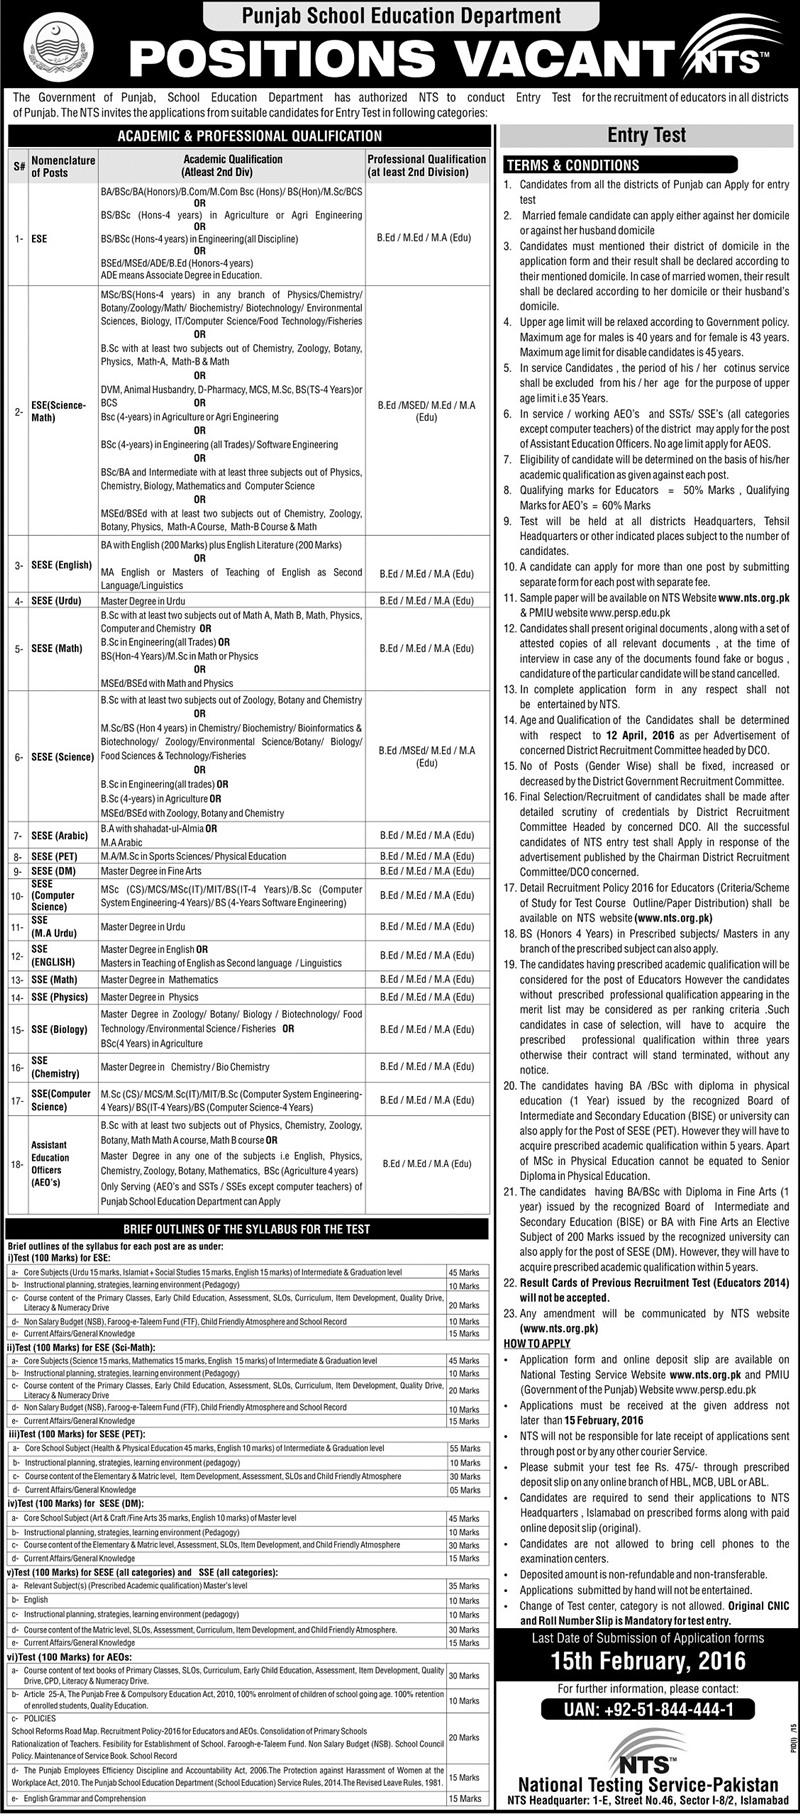 Punjab Educators Jobs 2016 for District Gujrat Interview Dates